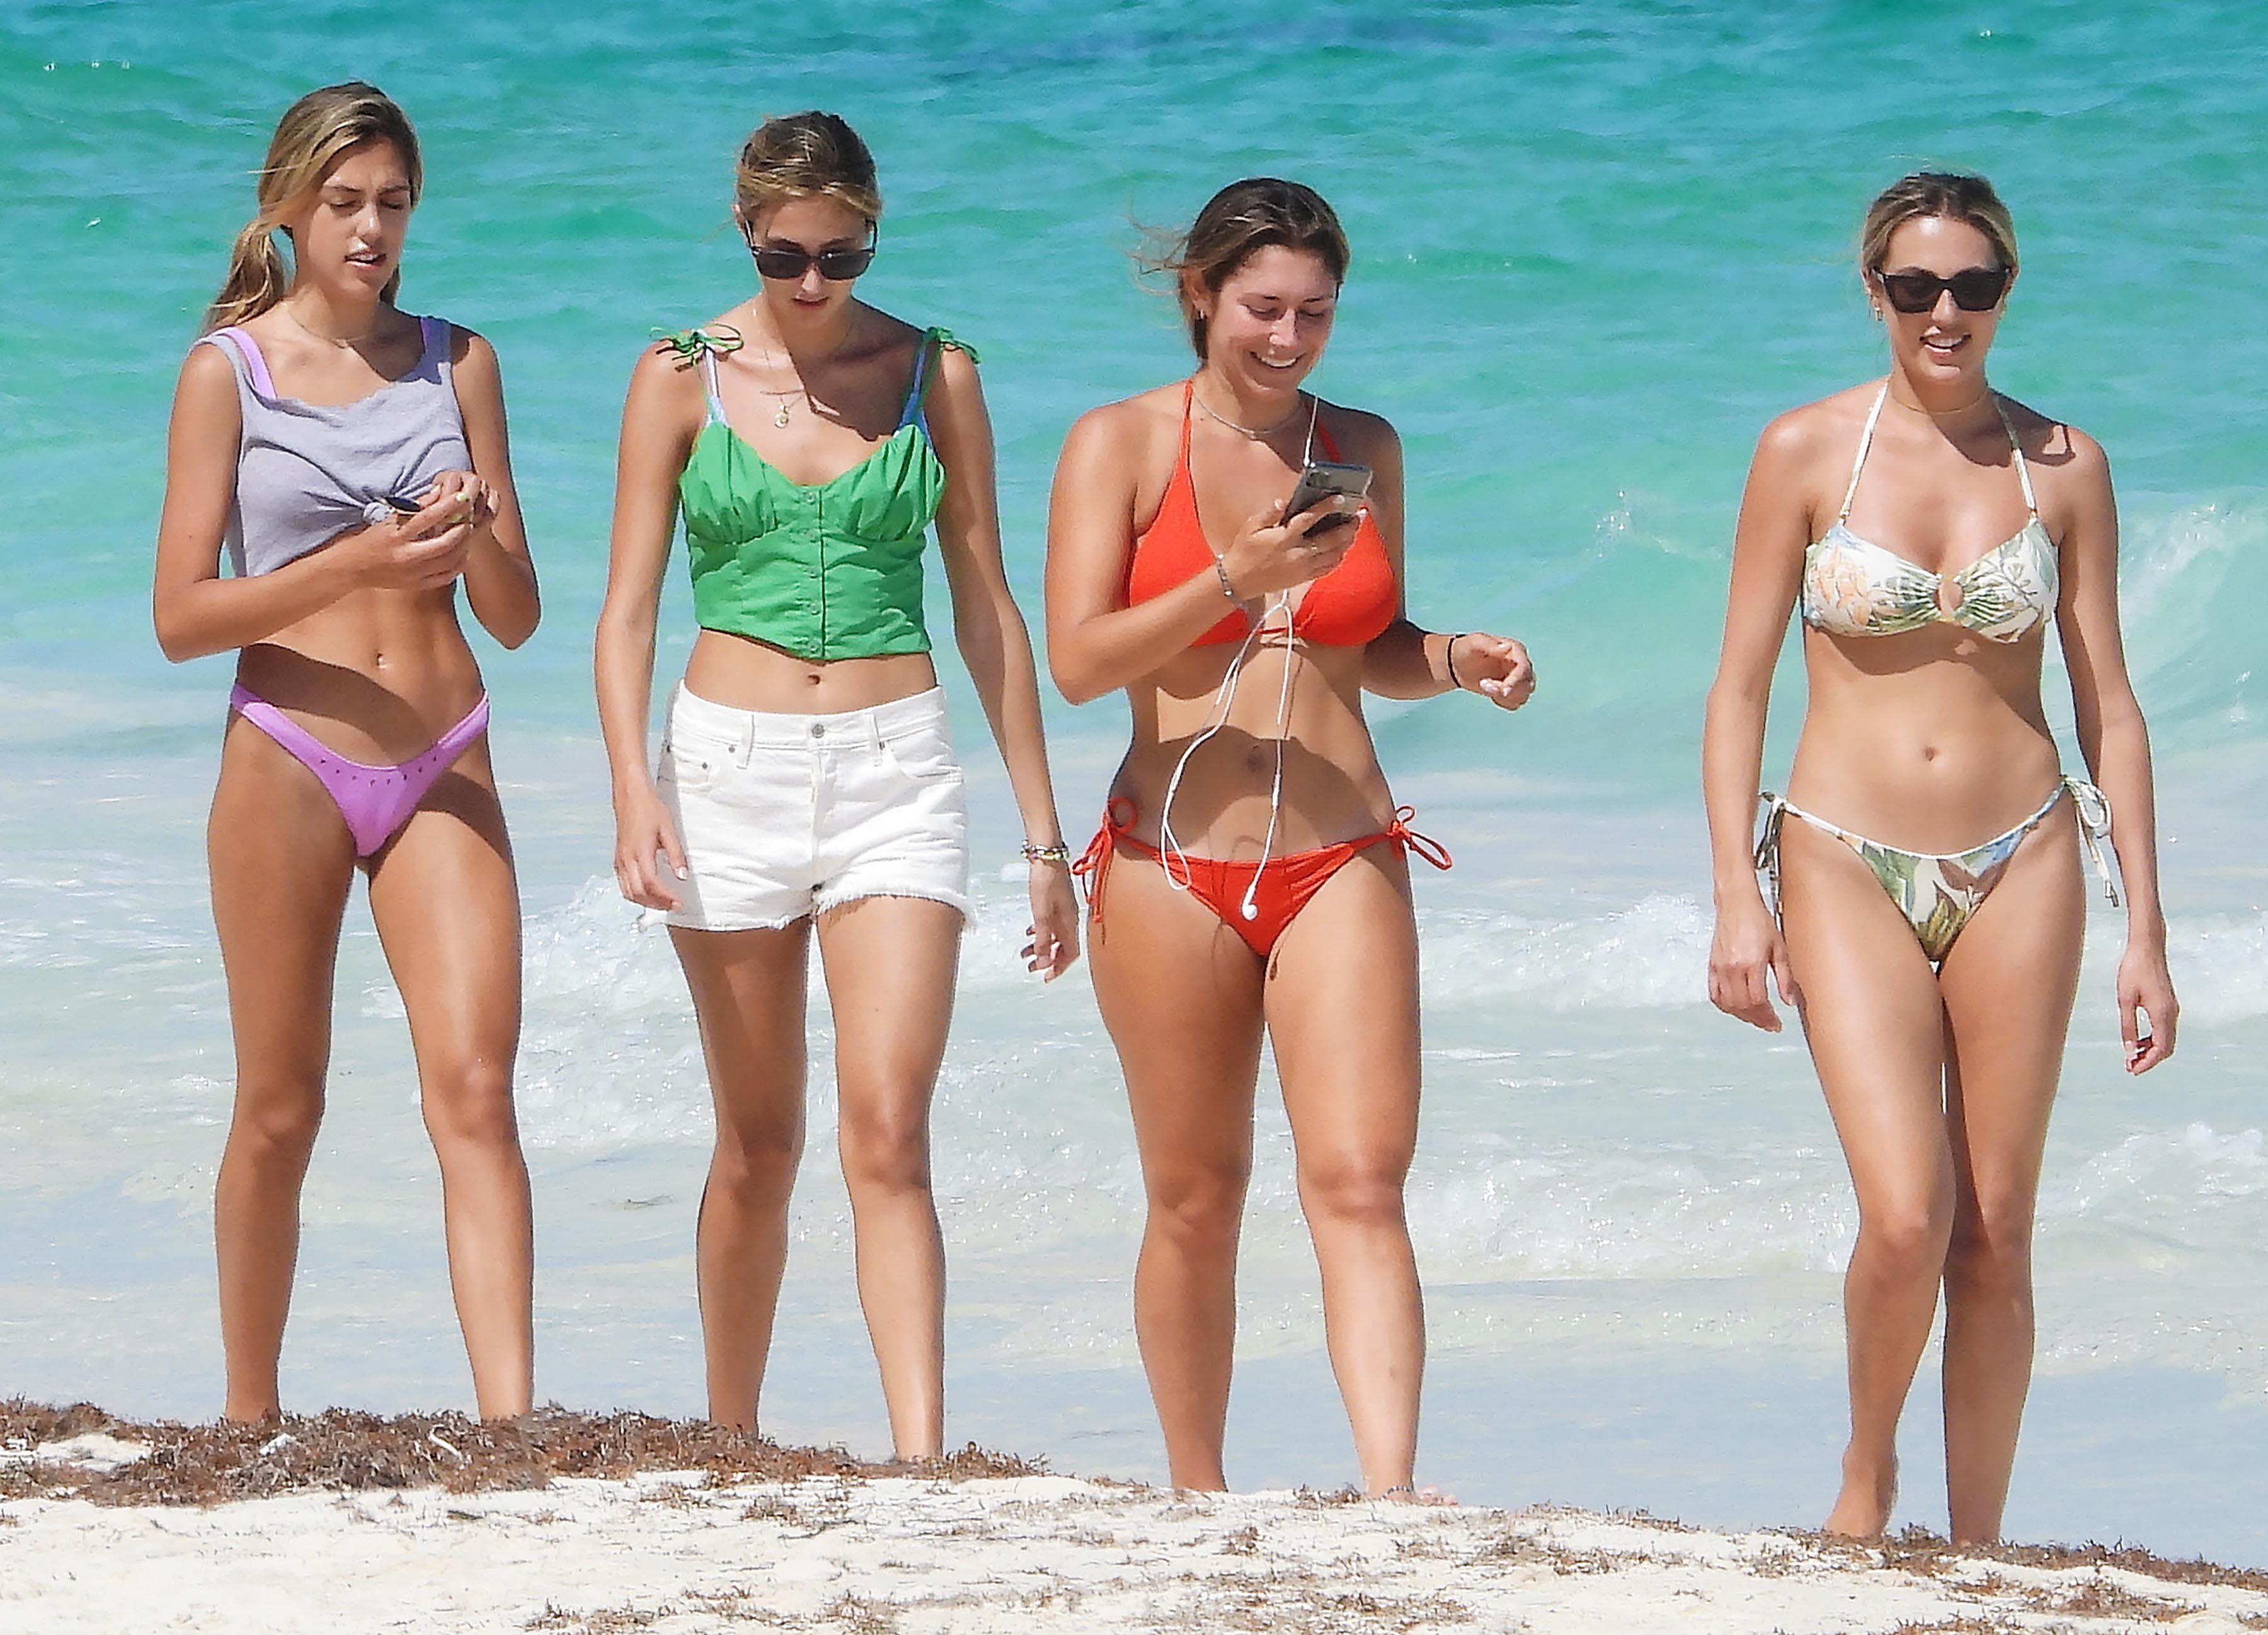 EXC Sistine Stallone, Sophia Stallone, Scarlet Stallone